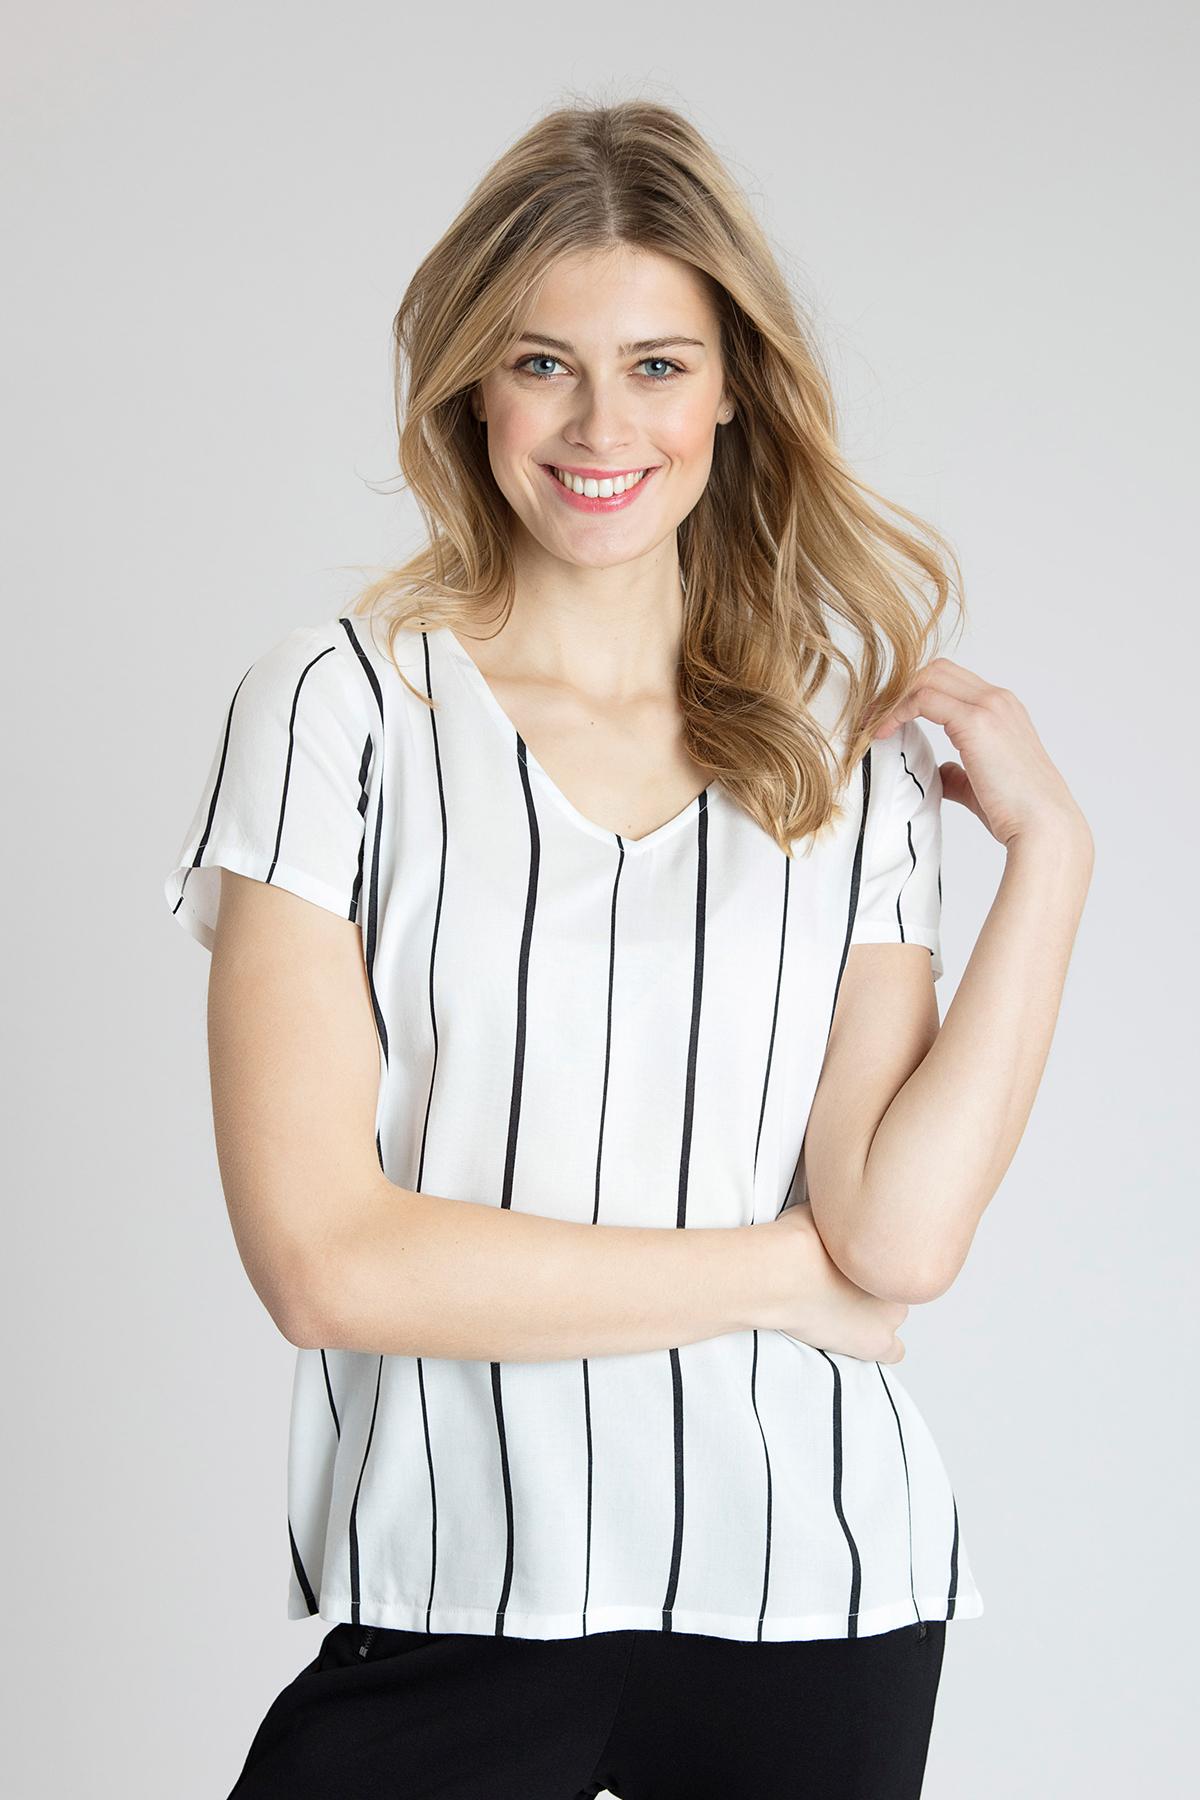 Wollweiss Kurzarm-Bluse von Kaffe – Shoppen SieWollweiss Kurzarm-Bluse ab Gr. 34-46 hier